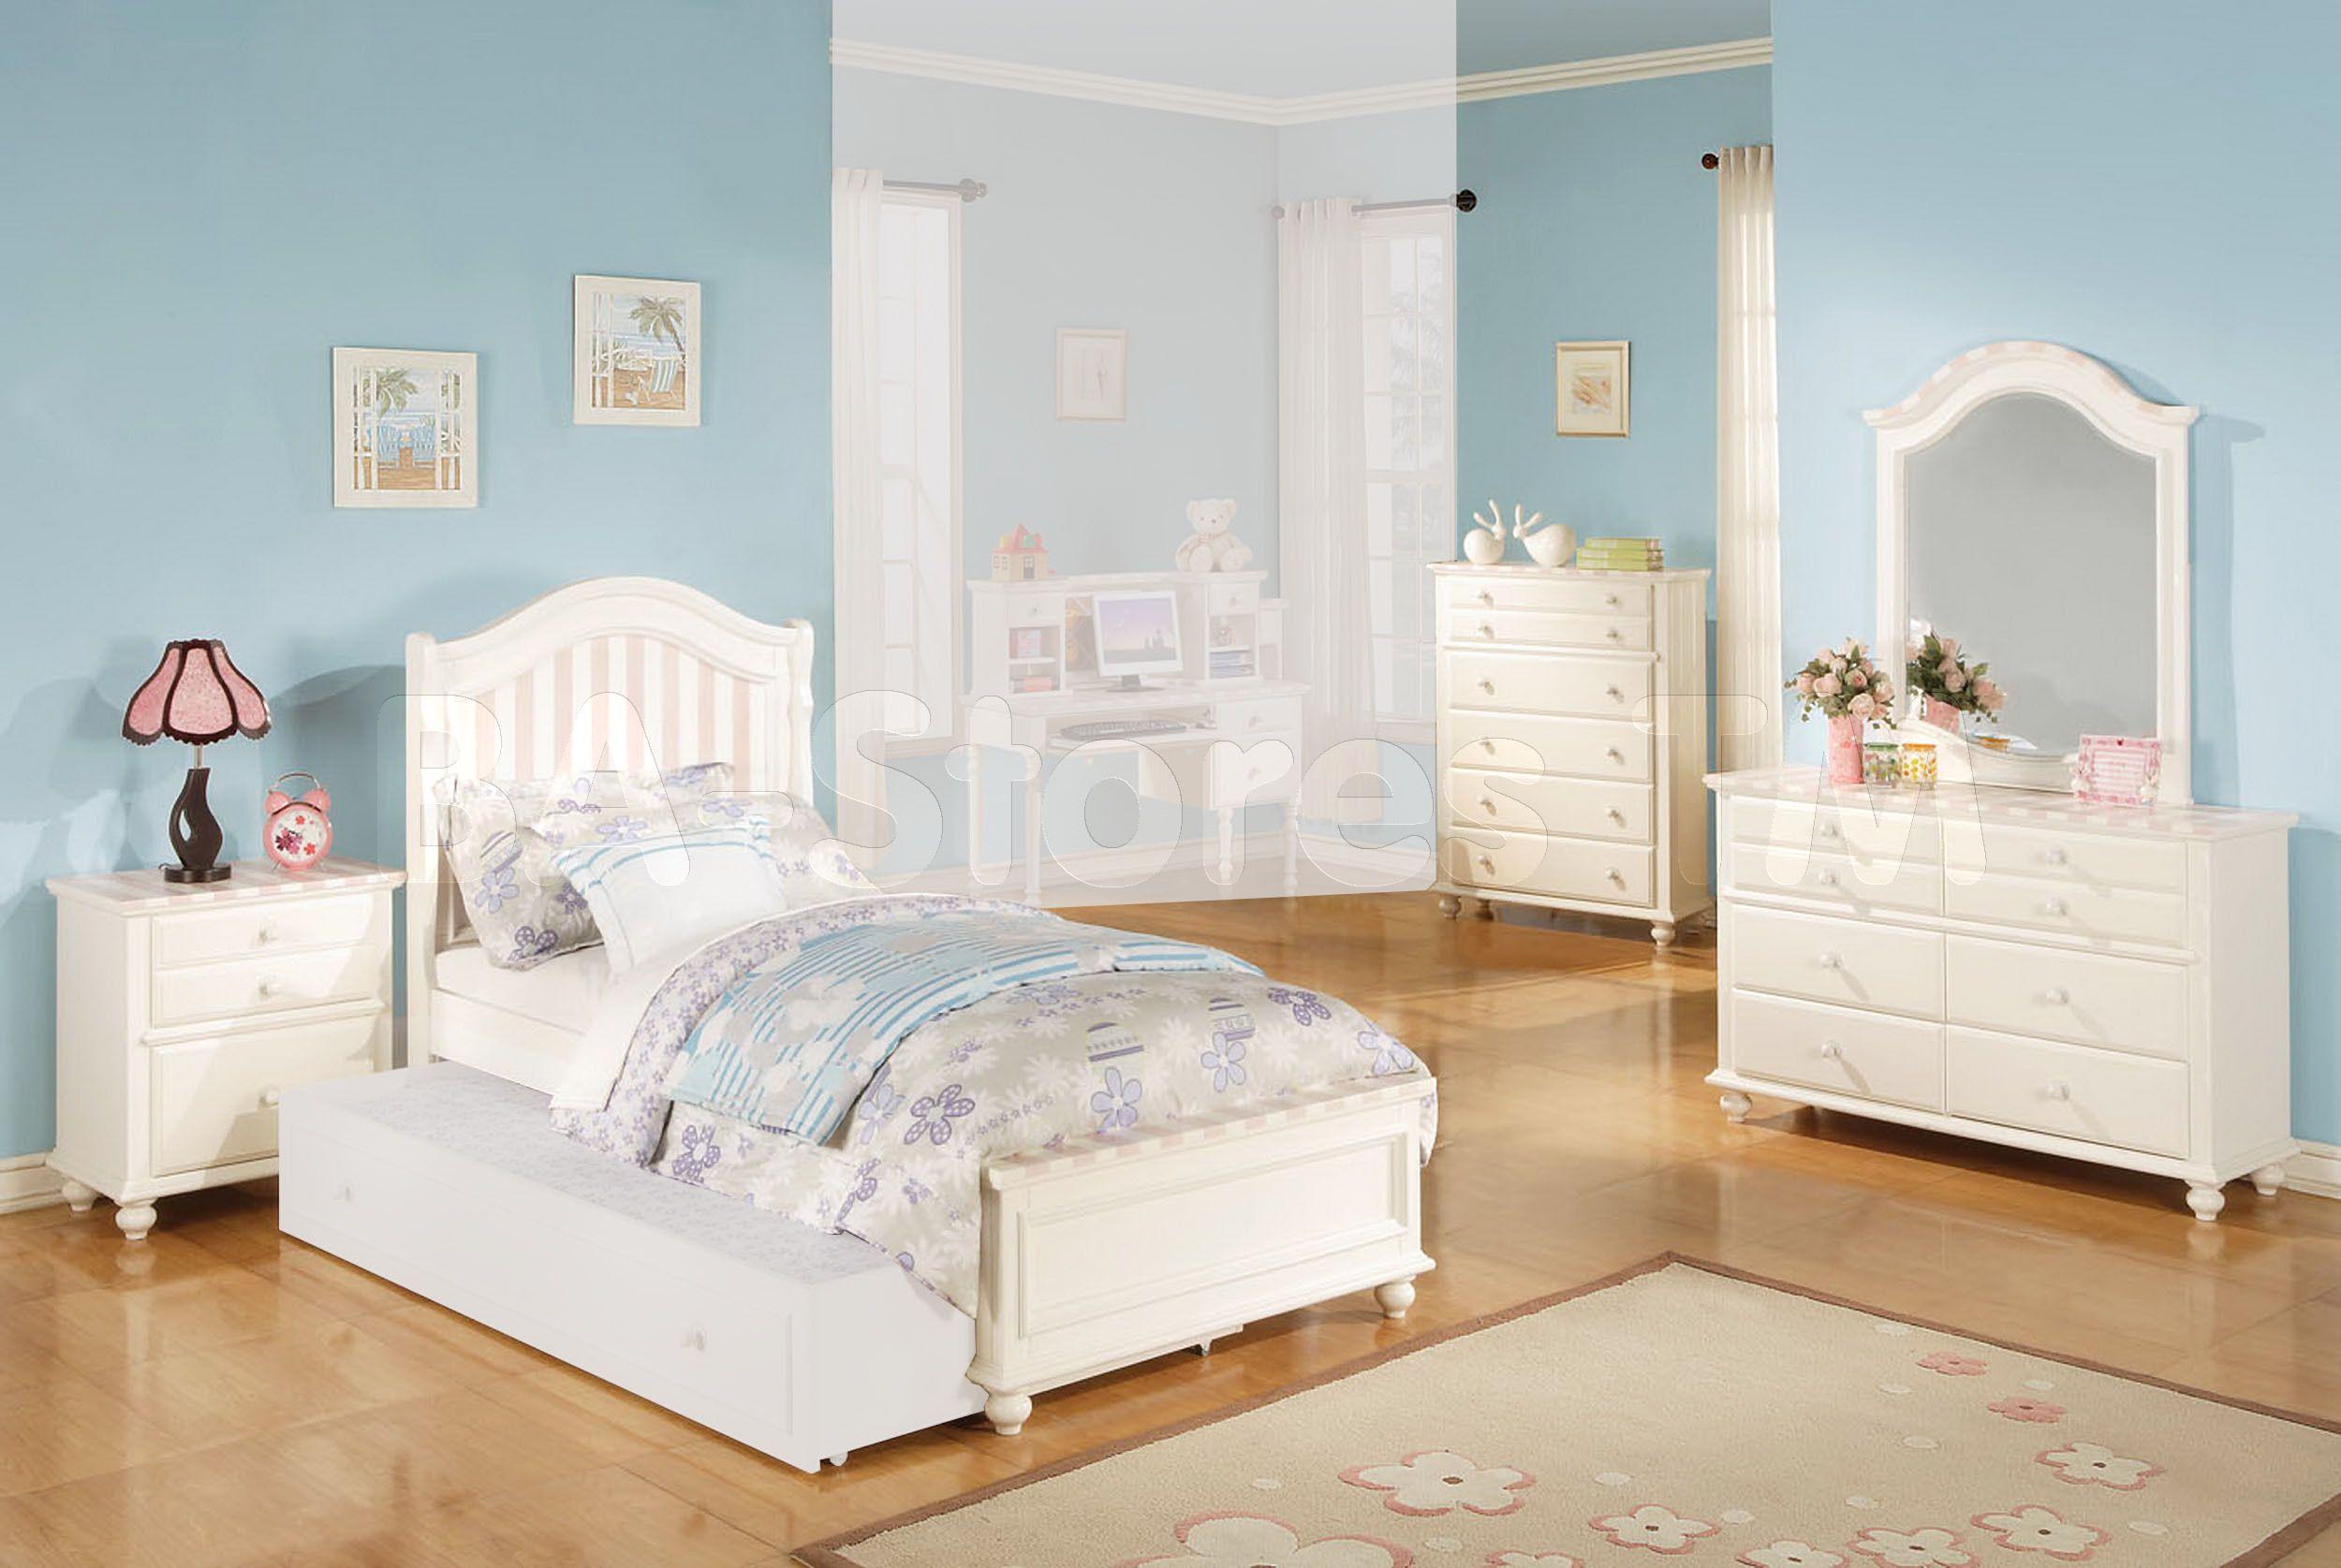 30 Inspired Picture Of Girls Bedroom Furniture With Images Kids Bedroom Furniture Sets Girls Bedroom Sets Girls Bedroom Furniture Sets Bedroom furniture kids bedroom